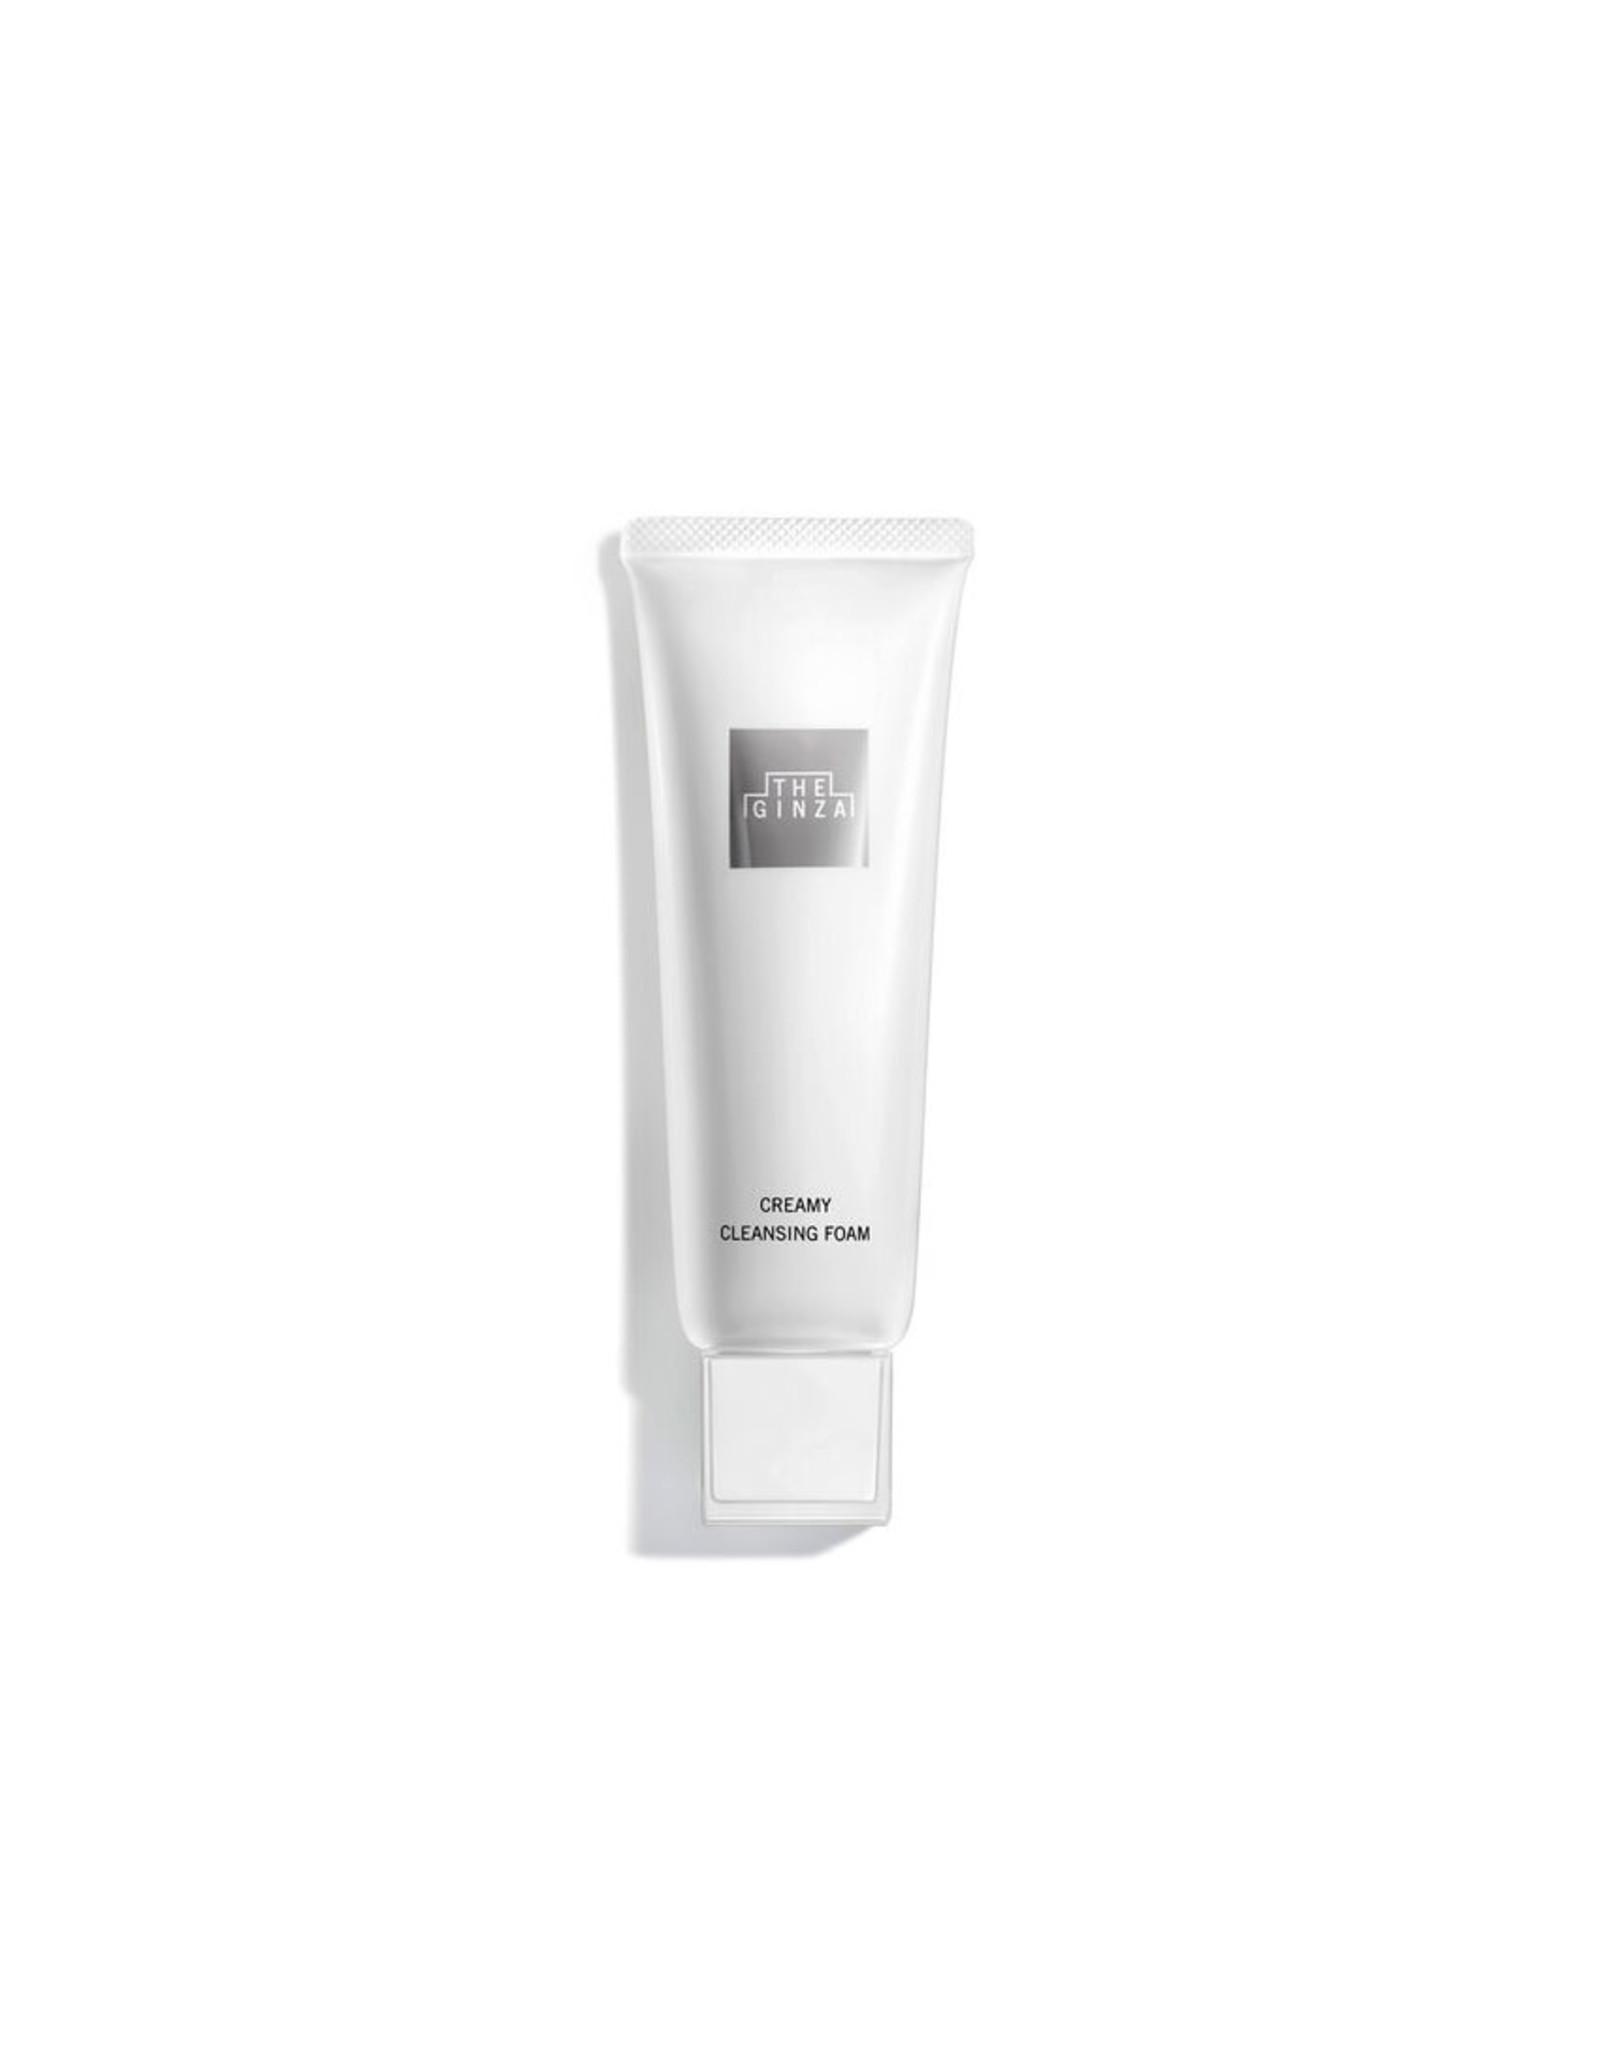 Shiseido The Ginza Creamy Cleansing Foam 130g